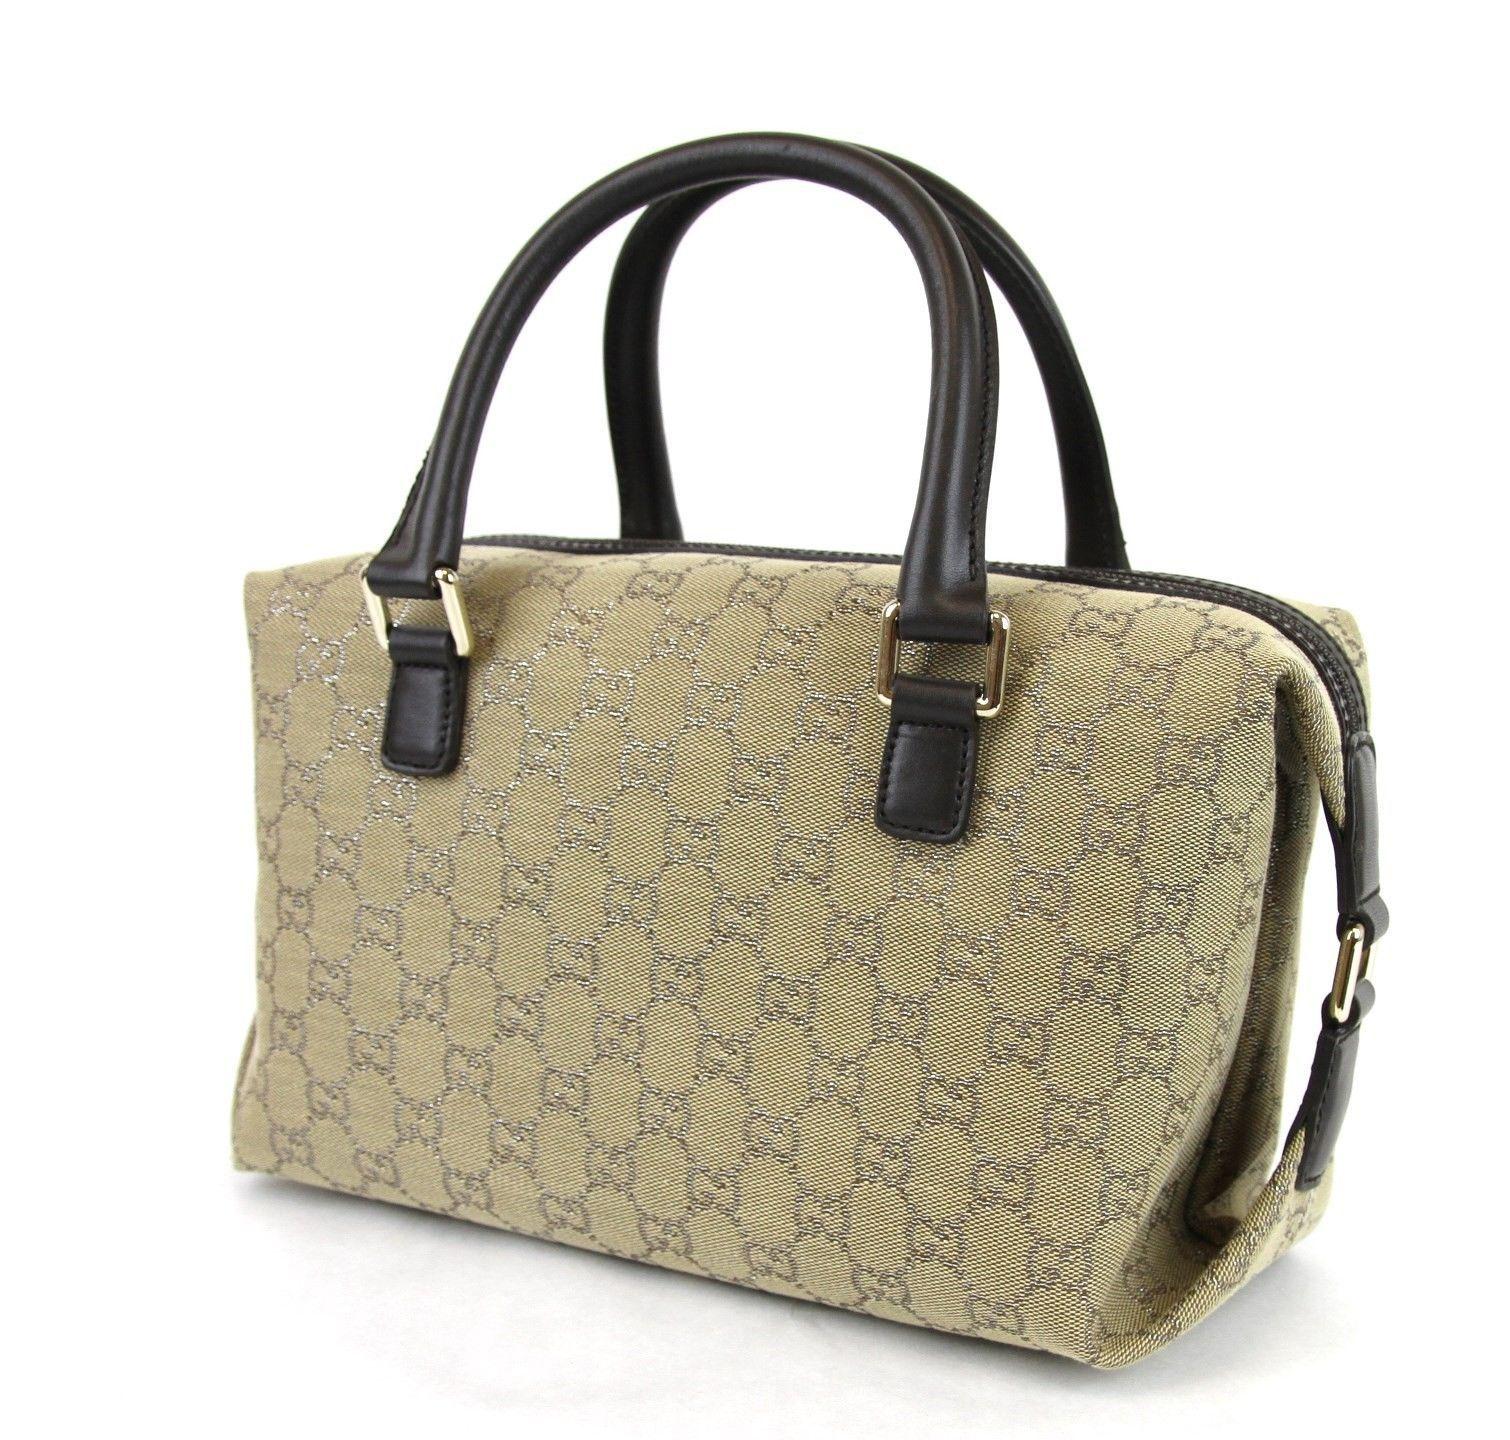 new authentic gucci original canvas joy boston bag handbag w silver